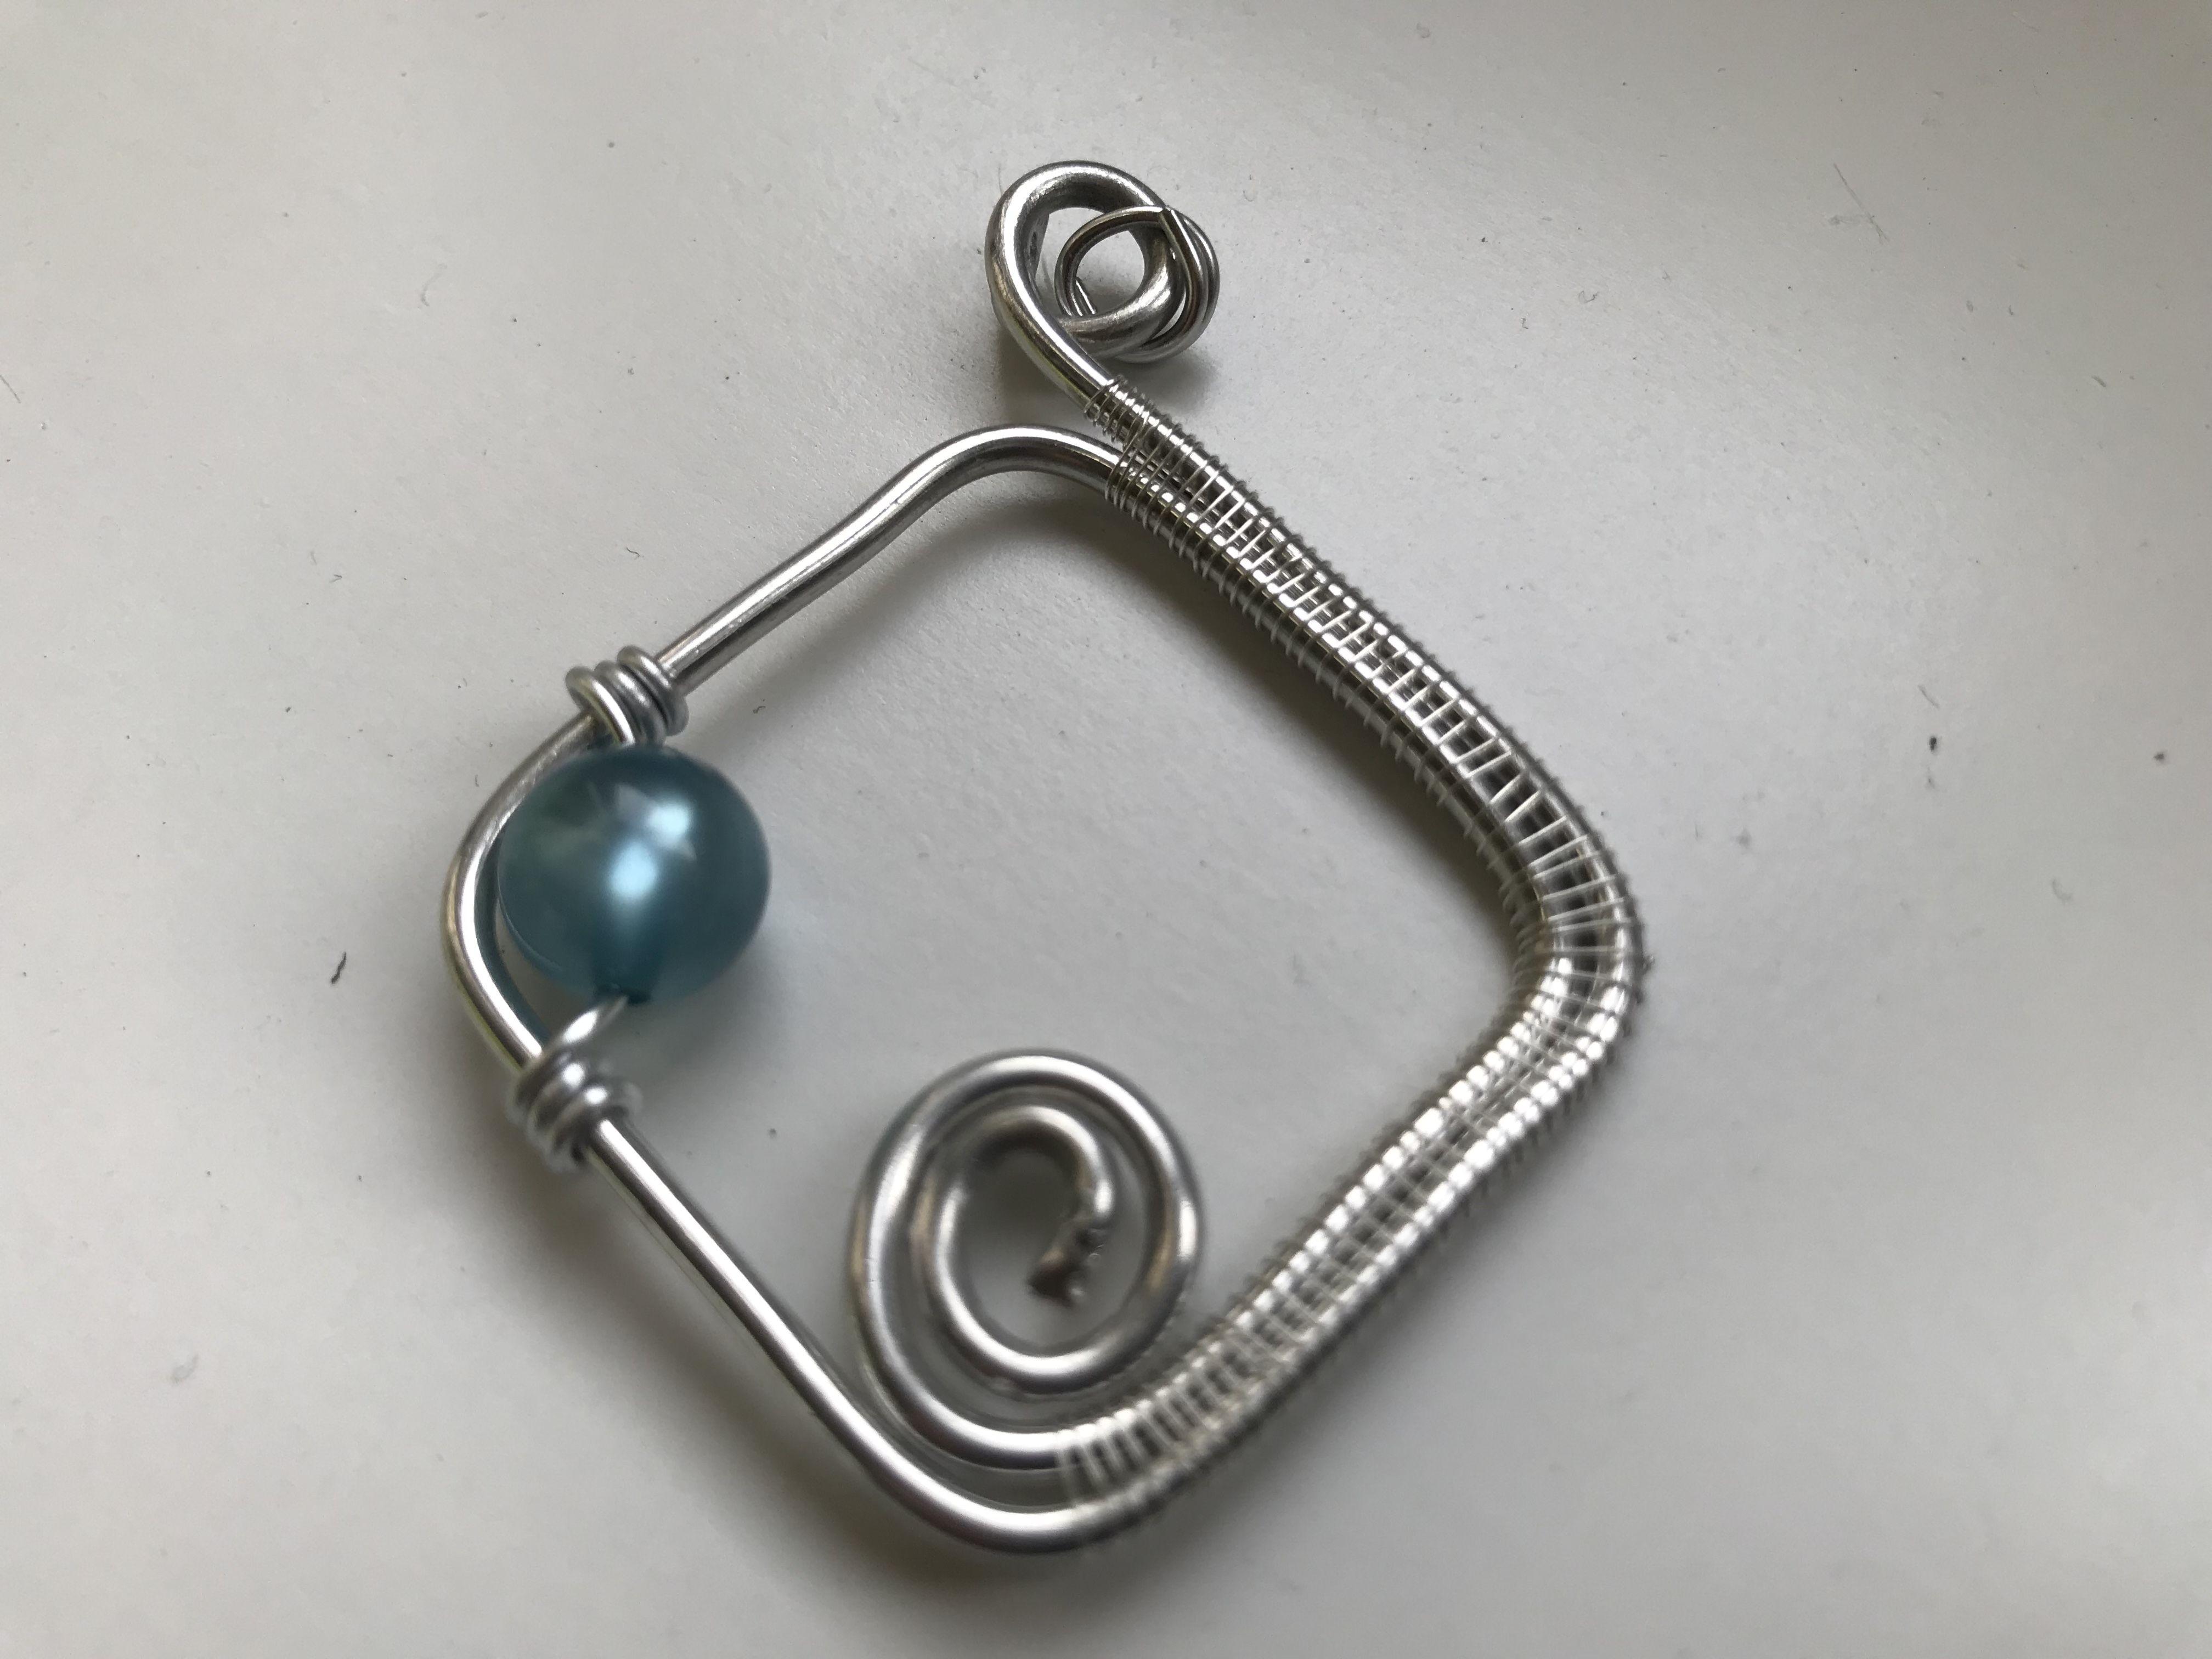 Pin by Rachel Stertz on Wire art Wire art, Belly button